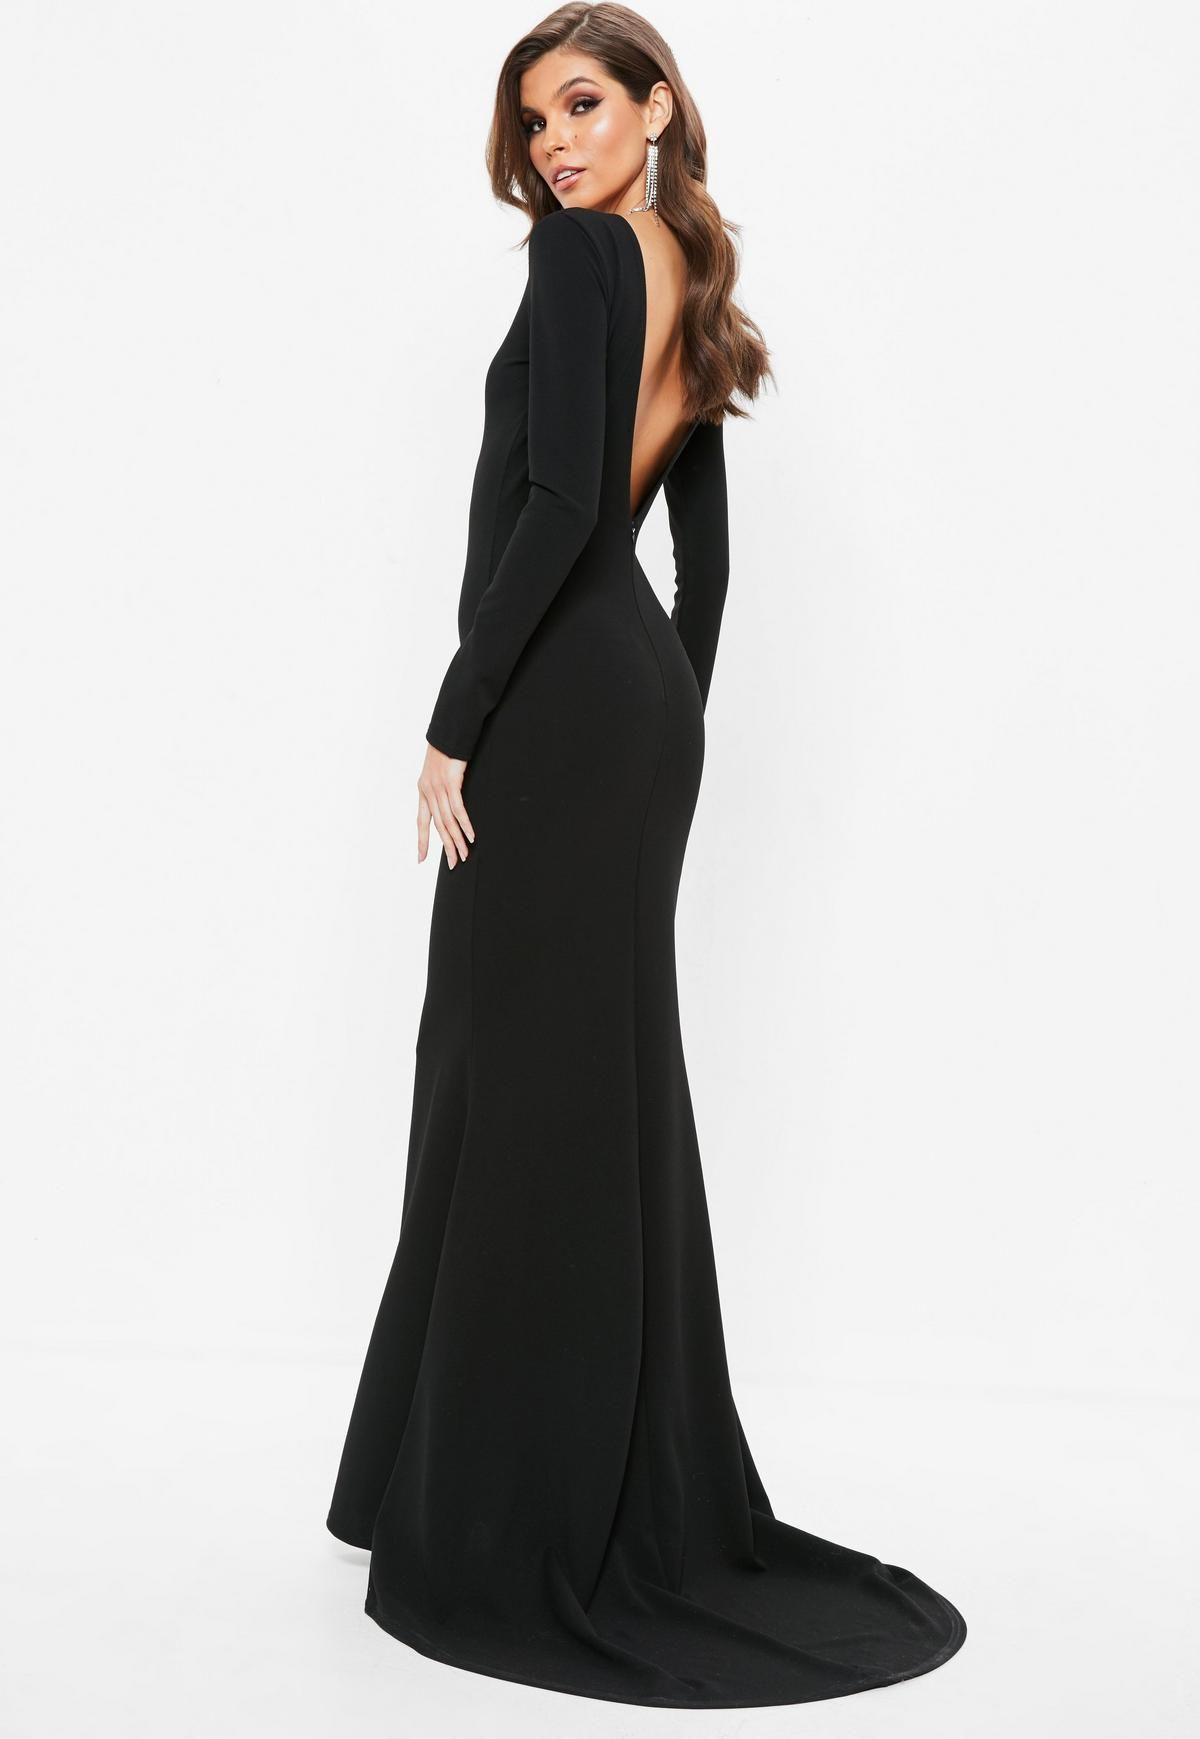 Missguided Black Open Back Maxi Dress Black Tie Event Dresses Maxi Dress Black Gown Dress